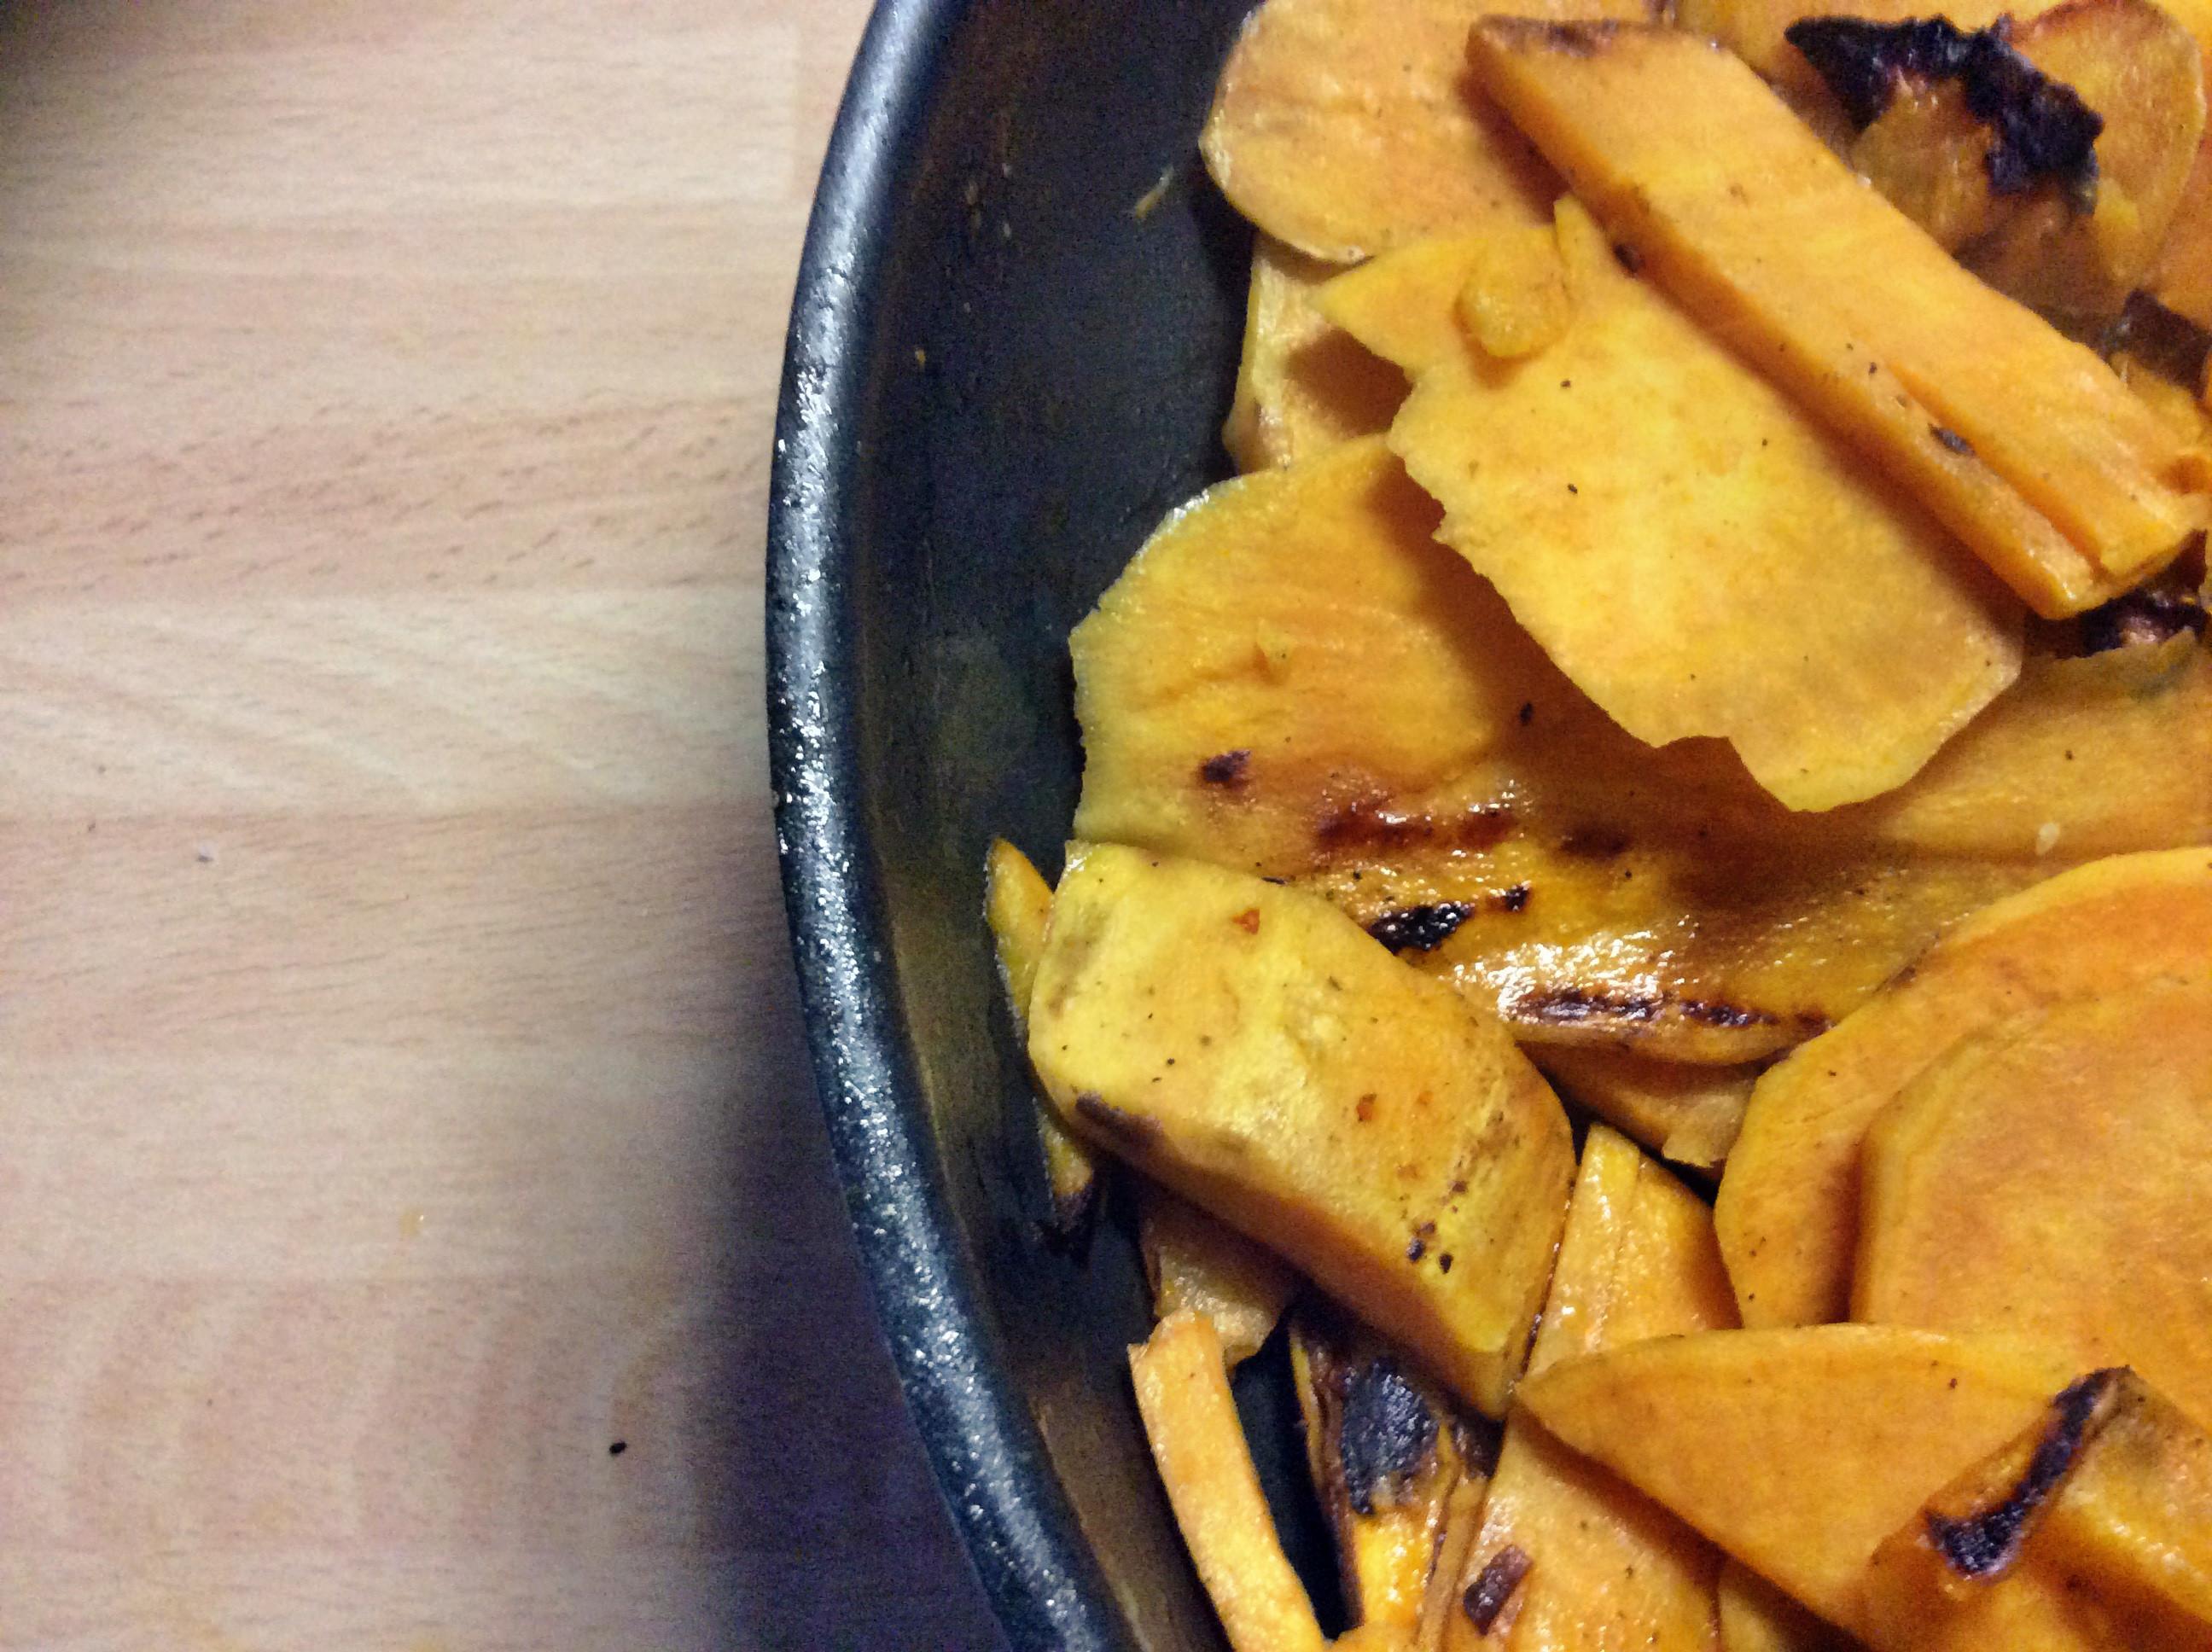 Süßkartoffeln,Lachsforelle,Salatr,- 21.915 (1b)